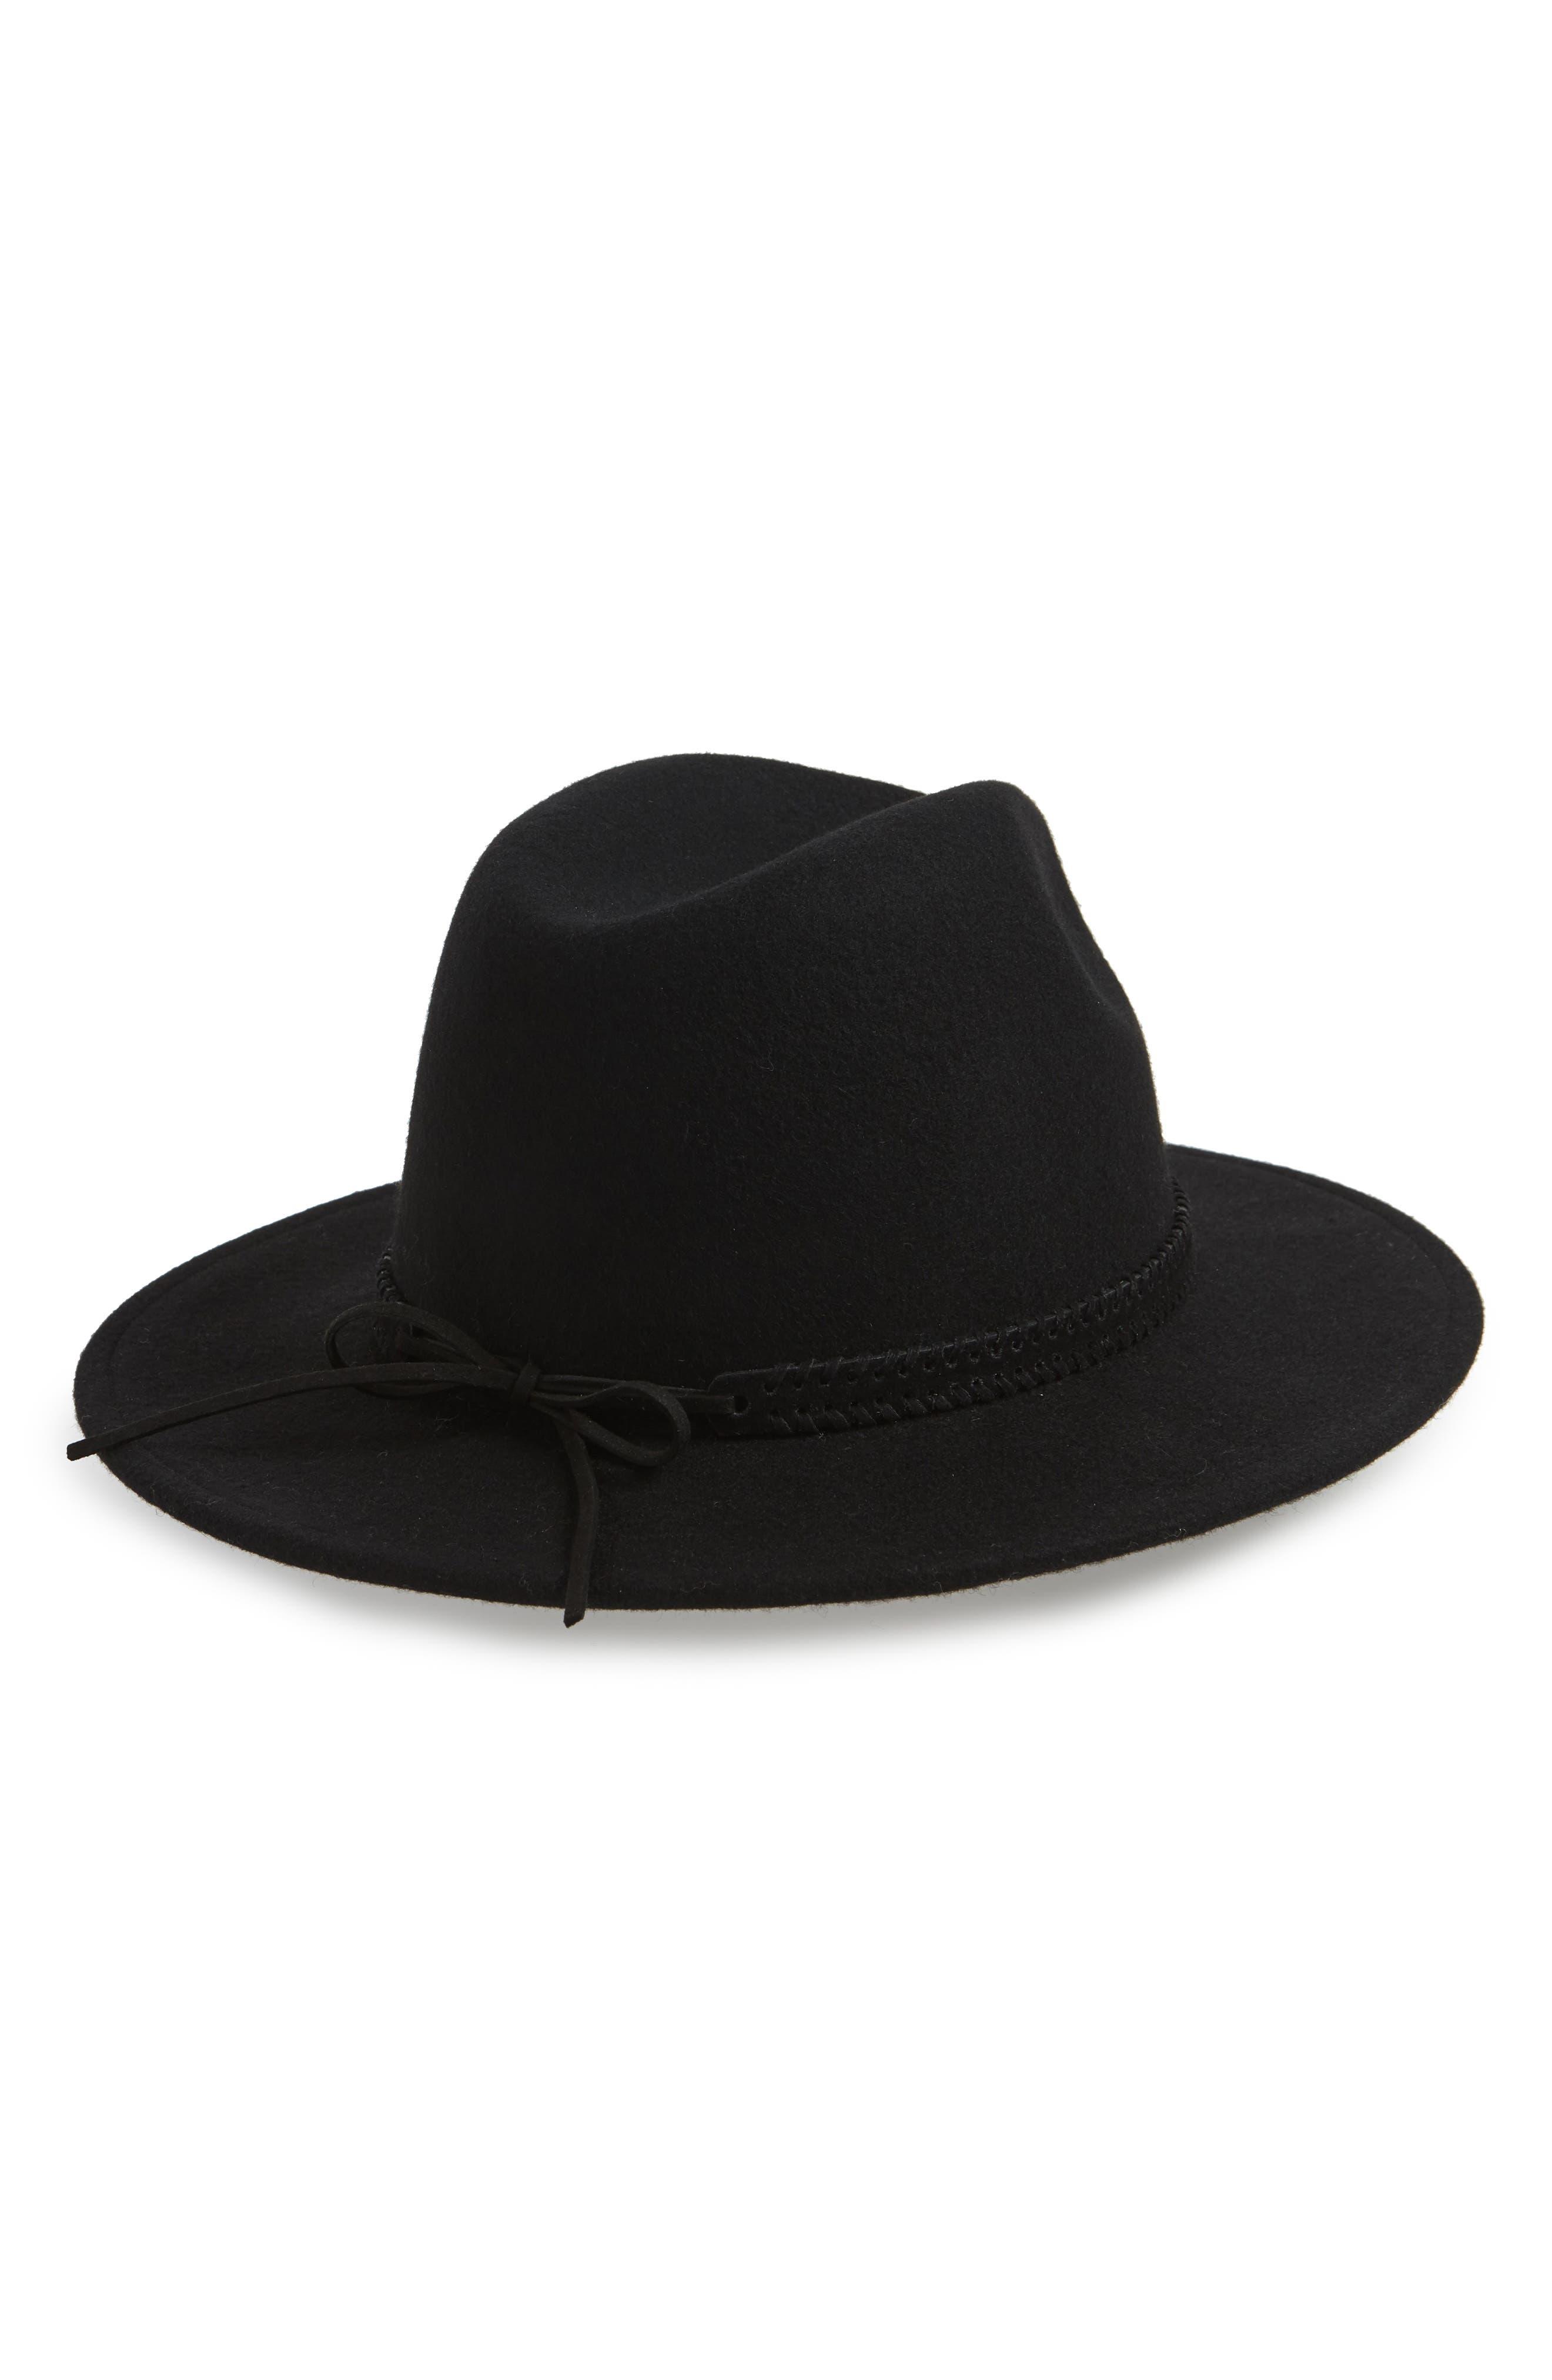 TREASURE & BOND,                             Felt Panama Hat,                             Alternate thumbnail 2, color,                             BLACK